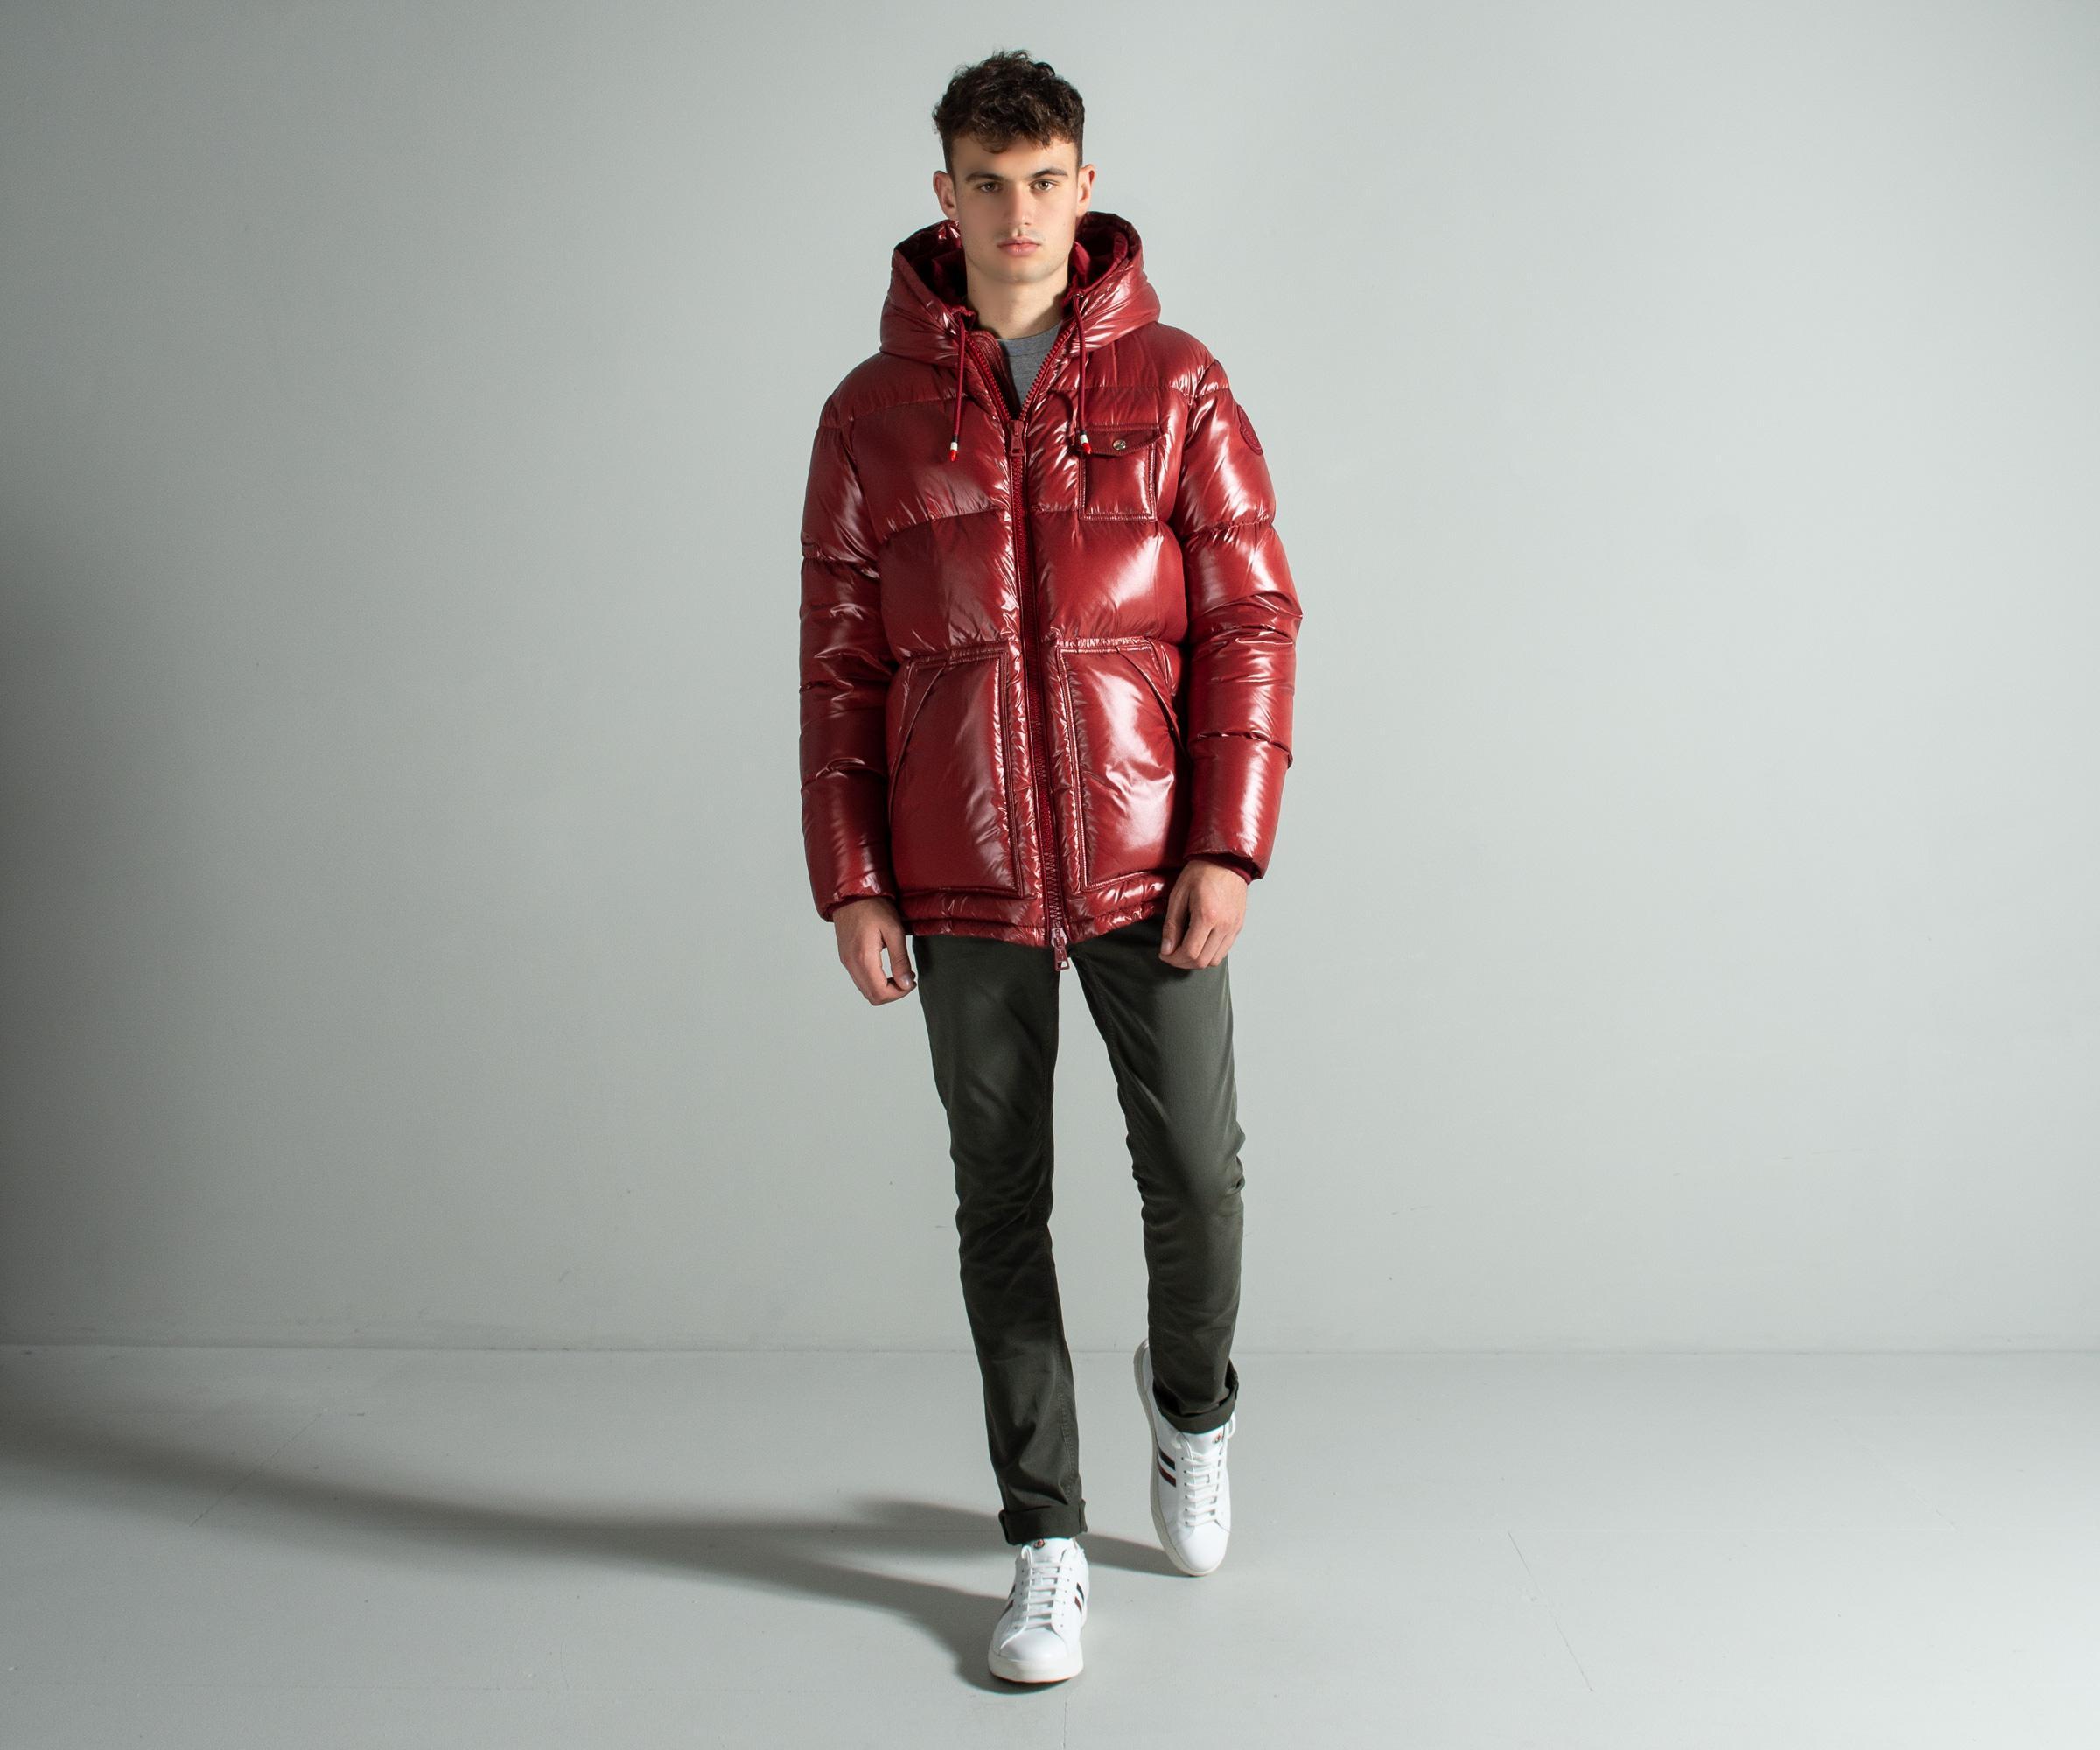 823c13134 Moncler Genius Project 2 - 'apremont' Hooded Down Jacket Deep Red ...